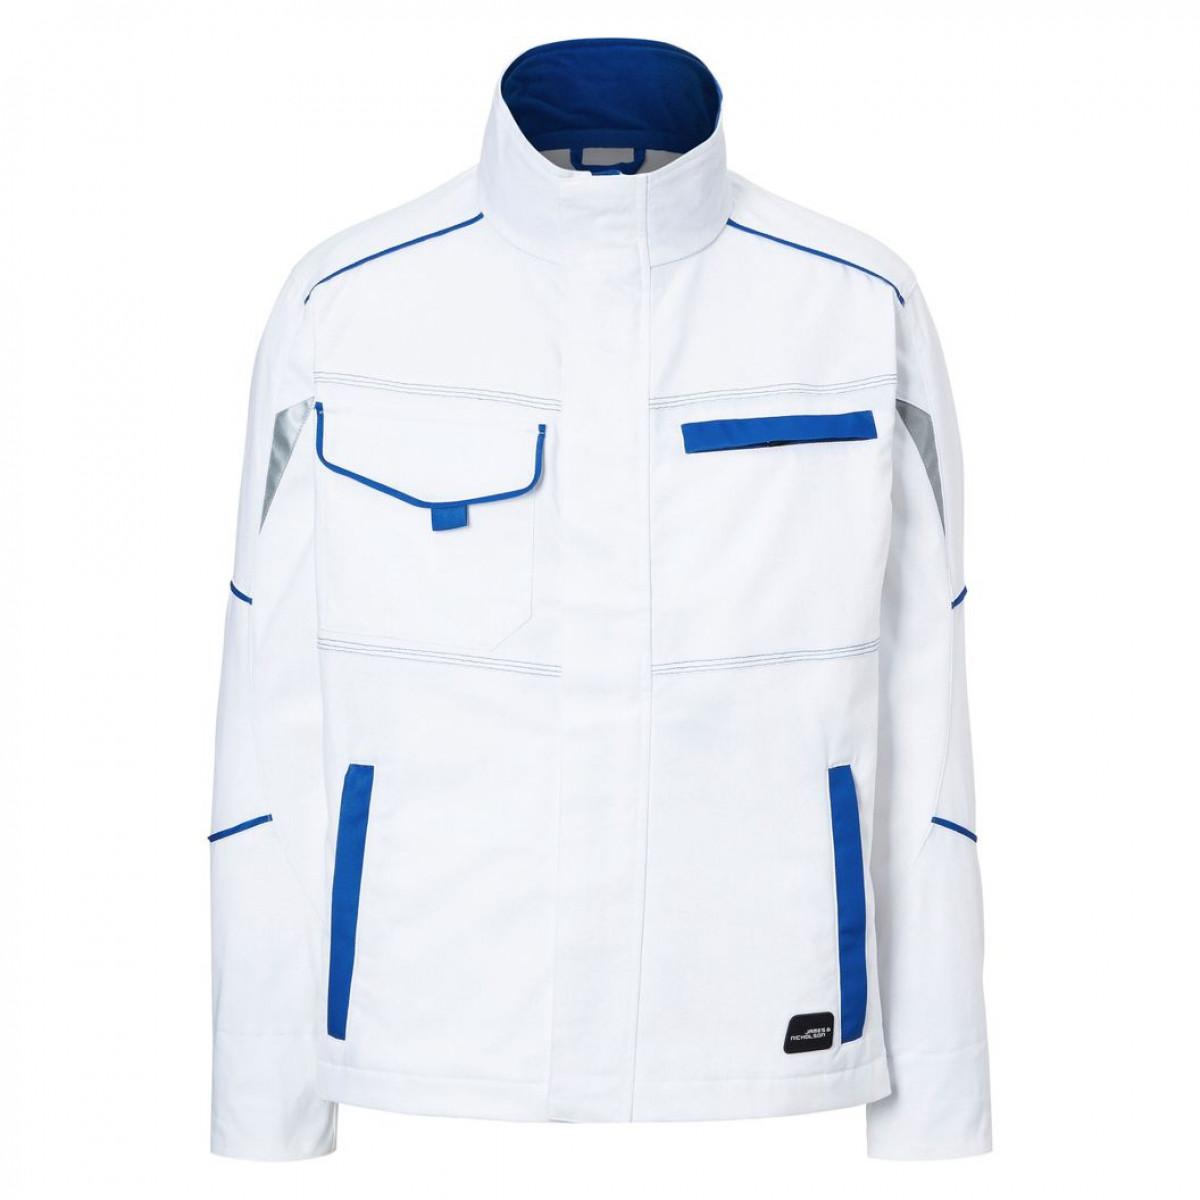 Куртка мужская JN849 Workwear Jacket - Белый/Ярко-синий